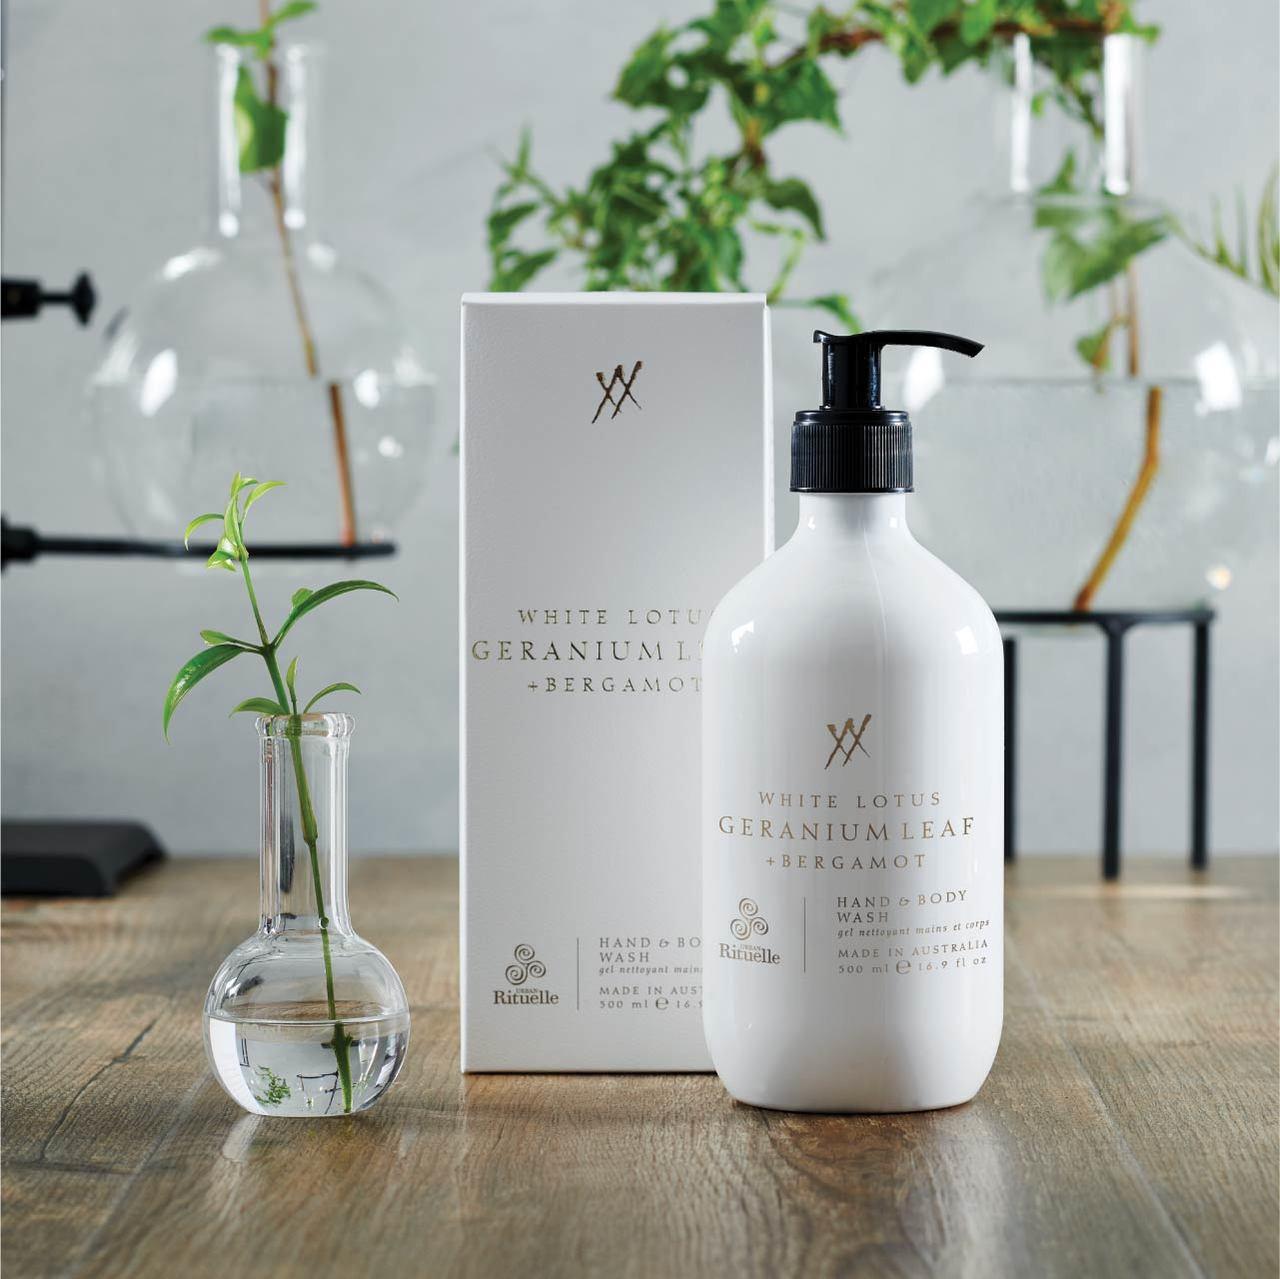 Alchemy - White Lotus, Geranium Leaf & Bergamot - Hand & Body Wash - Urban Rituelle